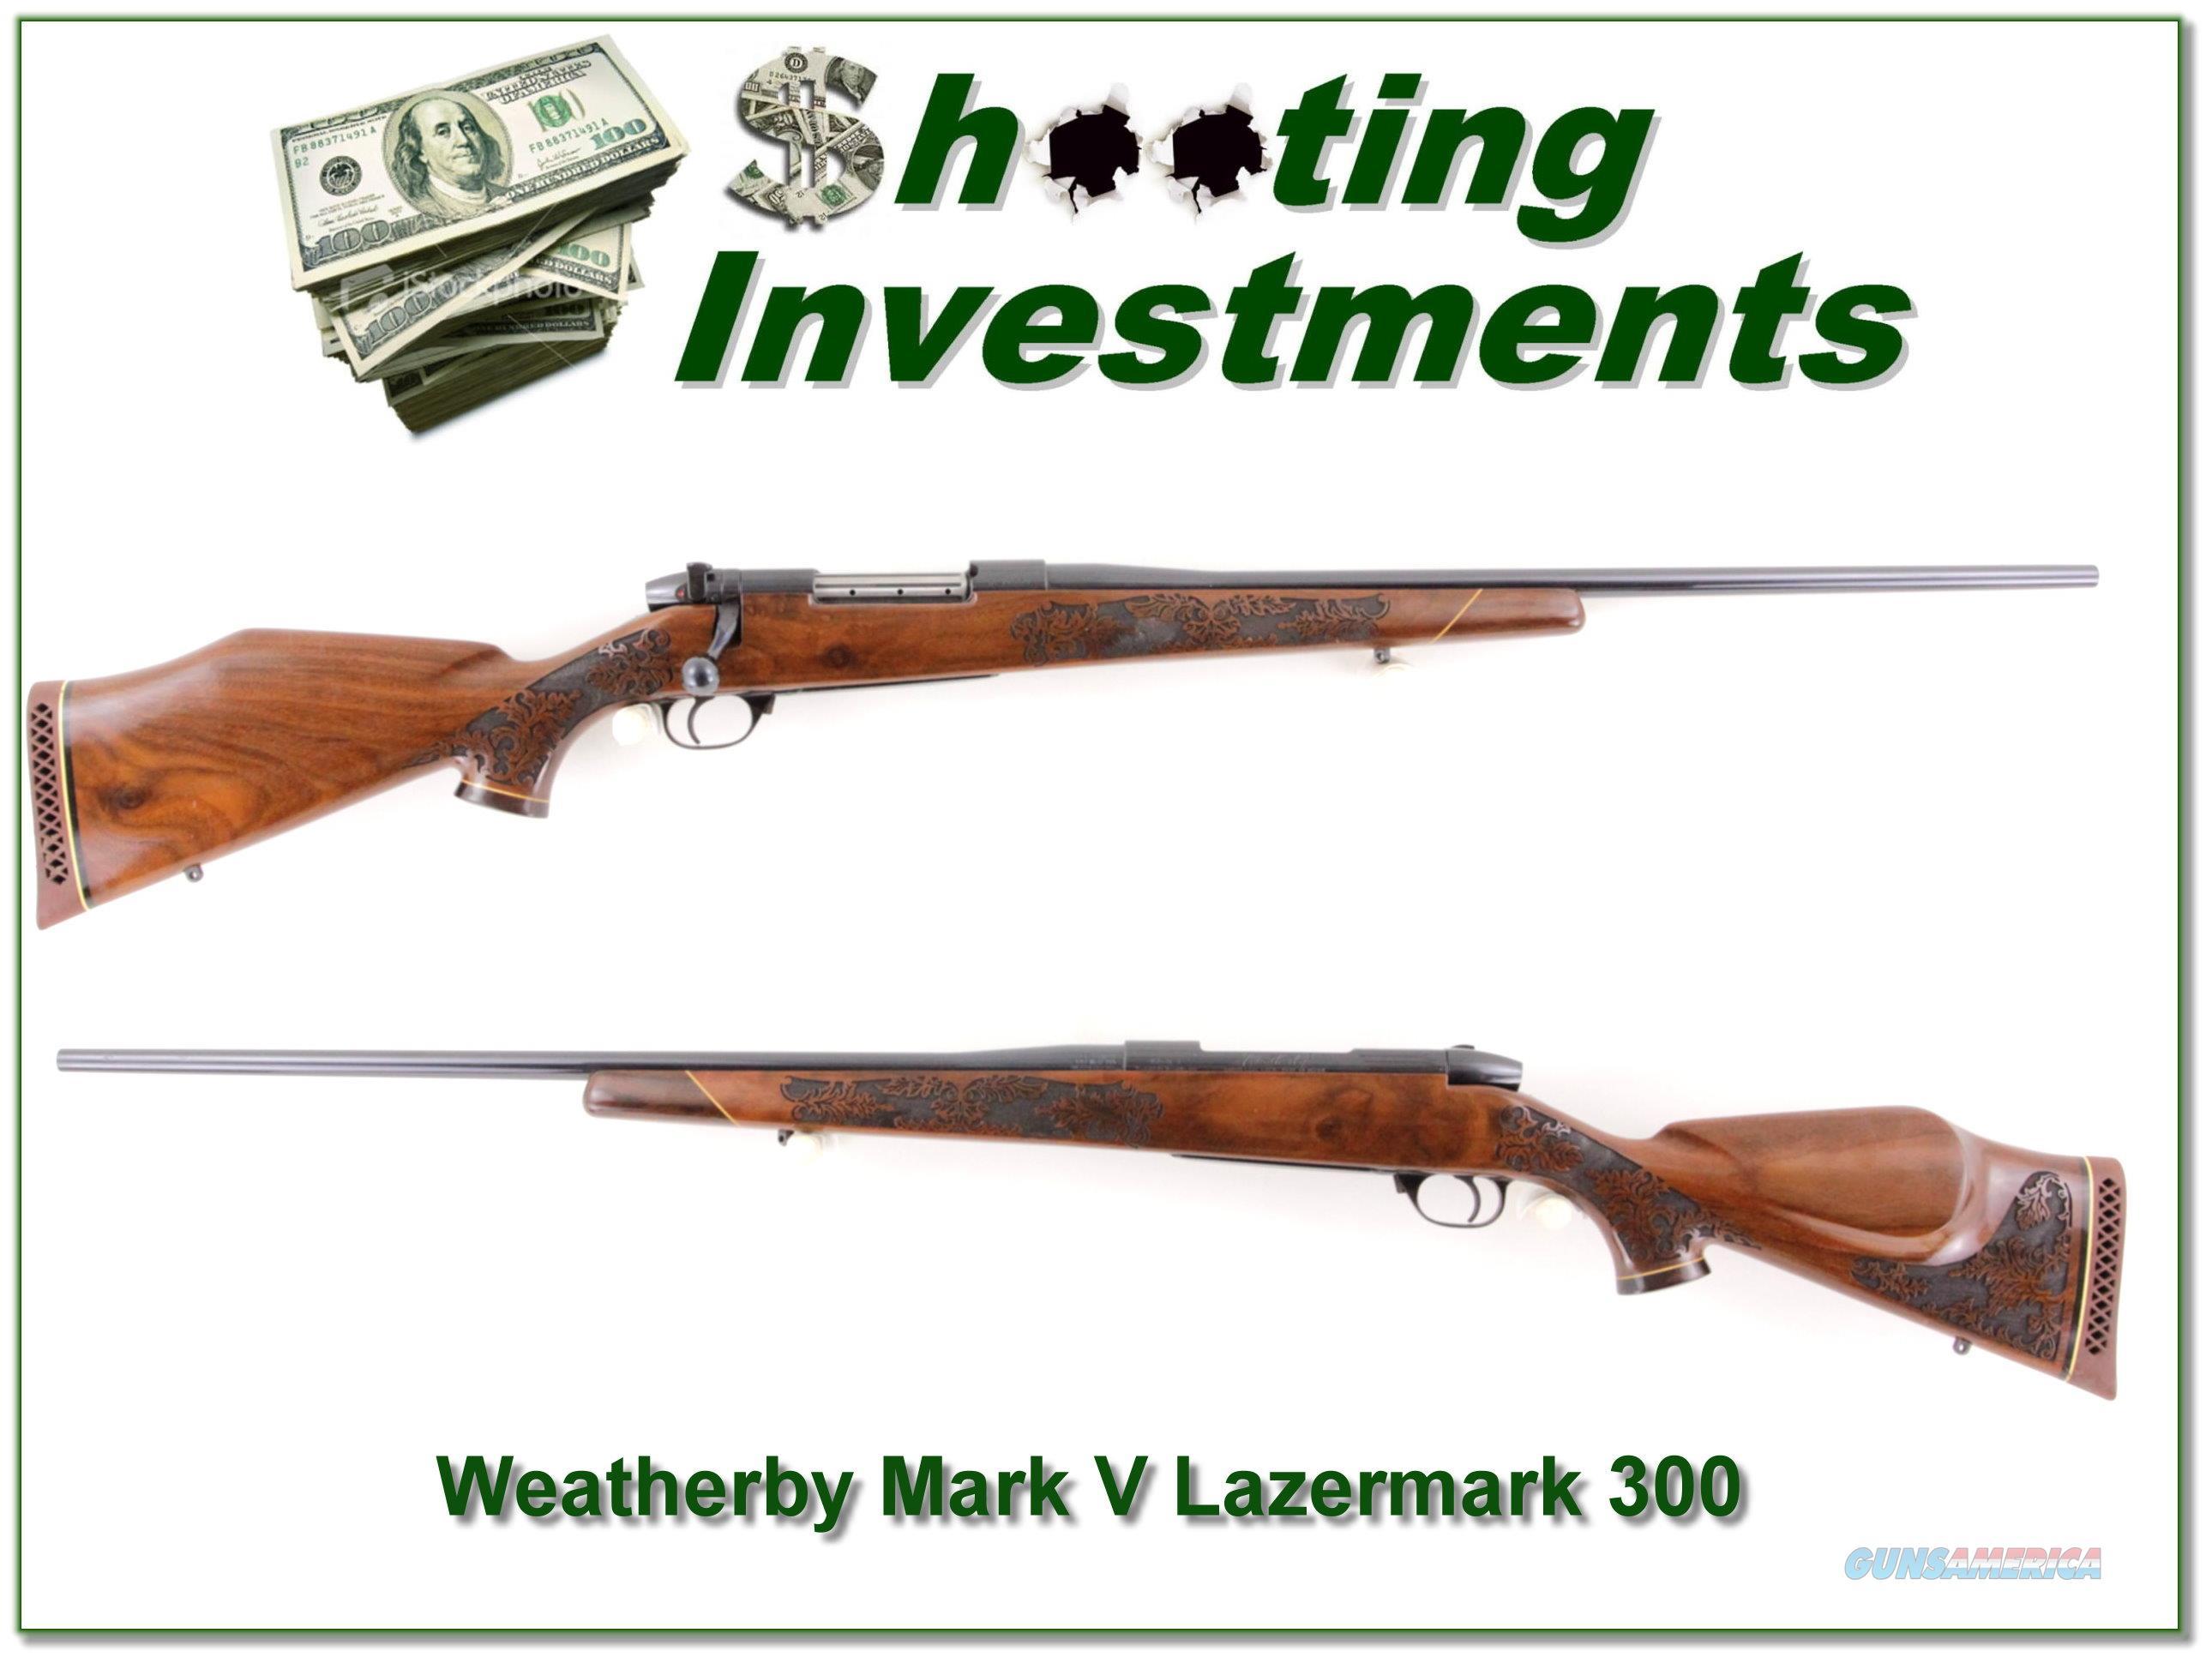 Weatherby Mark 5 Lazermark 5 Panel 300  Guns > Rifles > Weatherby Rifles > Sporting